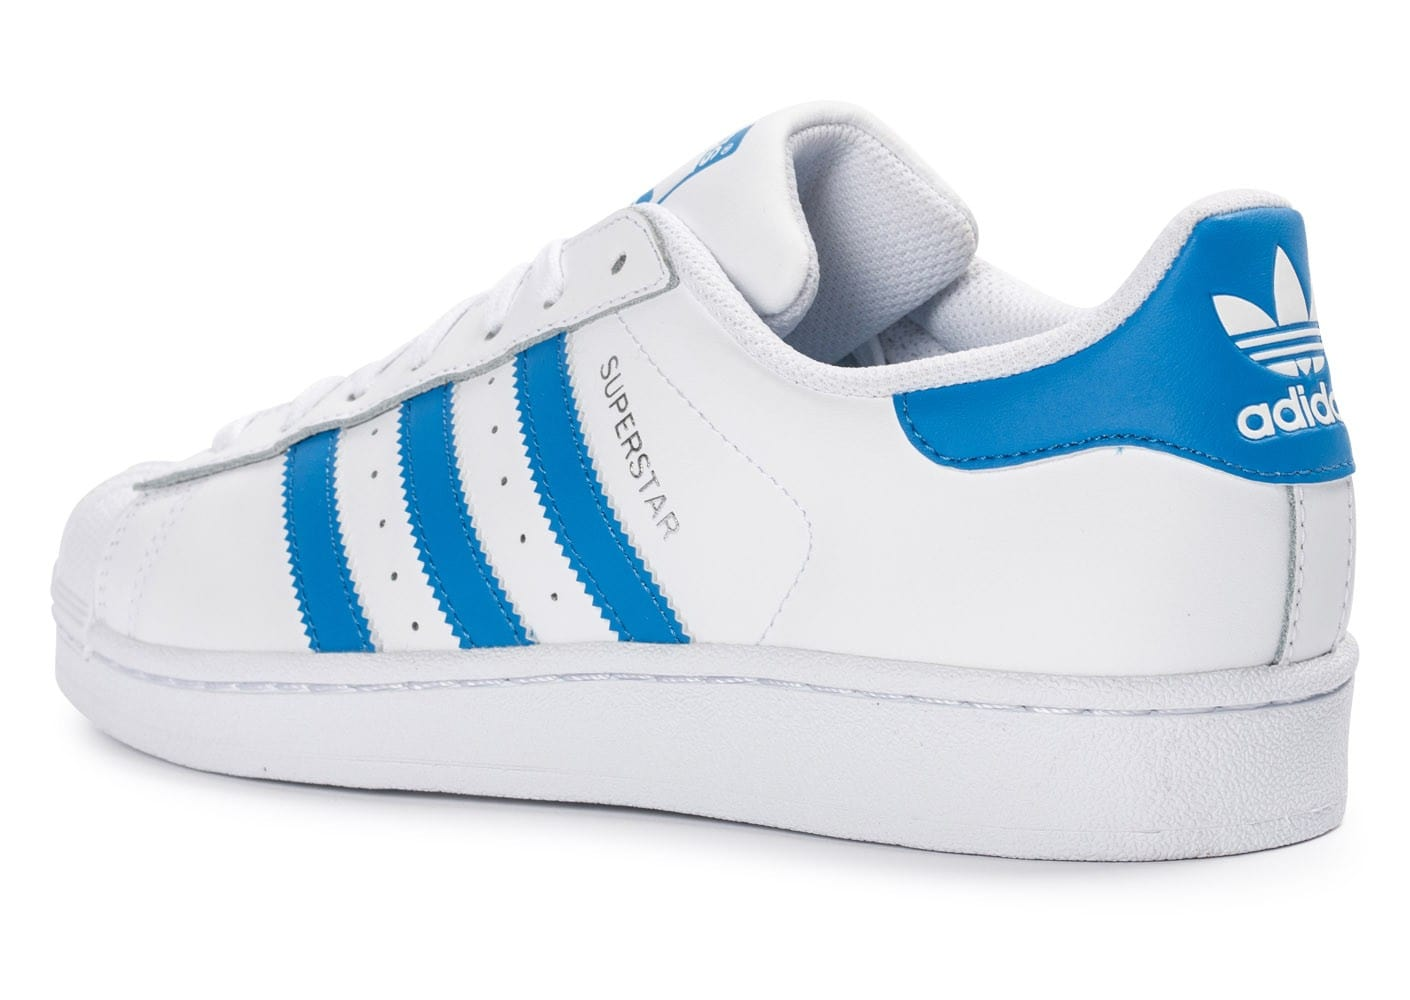 BASKET Baskets Adidas Superstar J ... adidas superstar blanc bleu marine. Adidas Superstar Festival Canvas Bleubird/Ftwr Blanche B36082 adidas superstar 2 ...